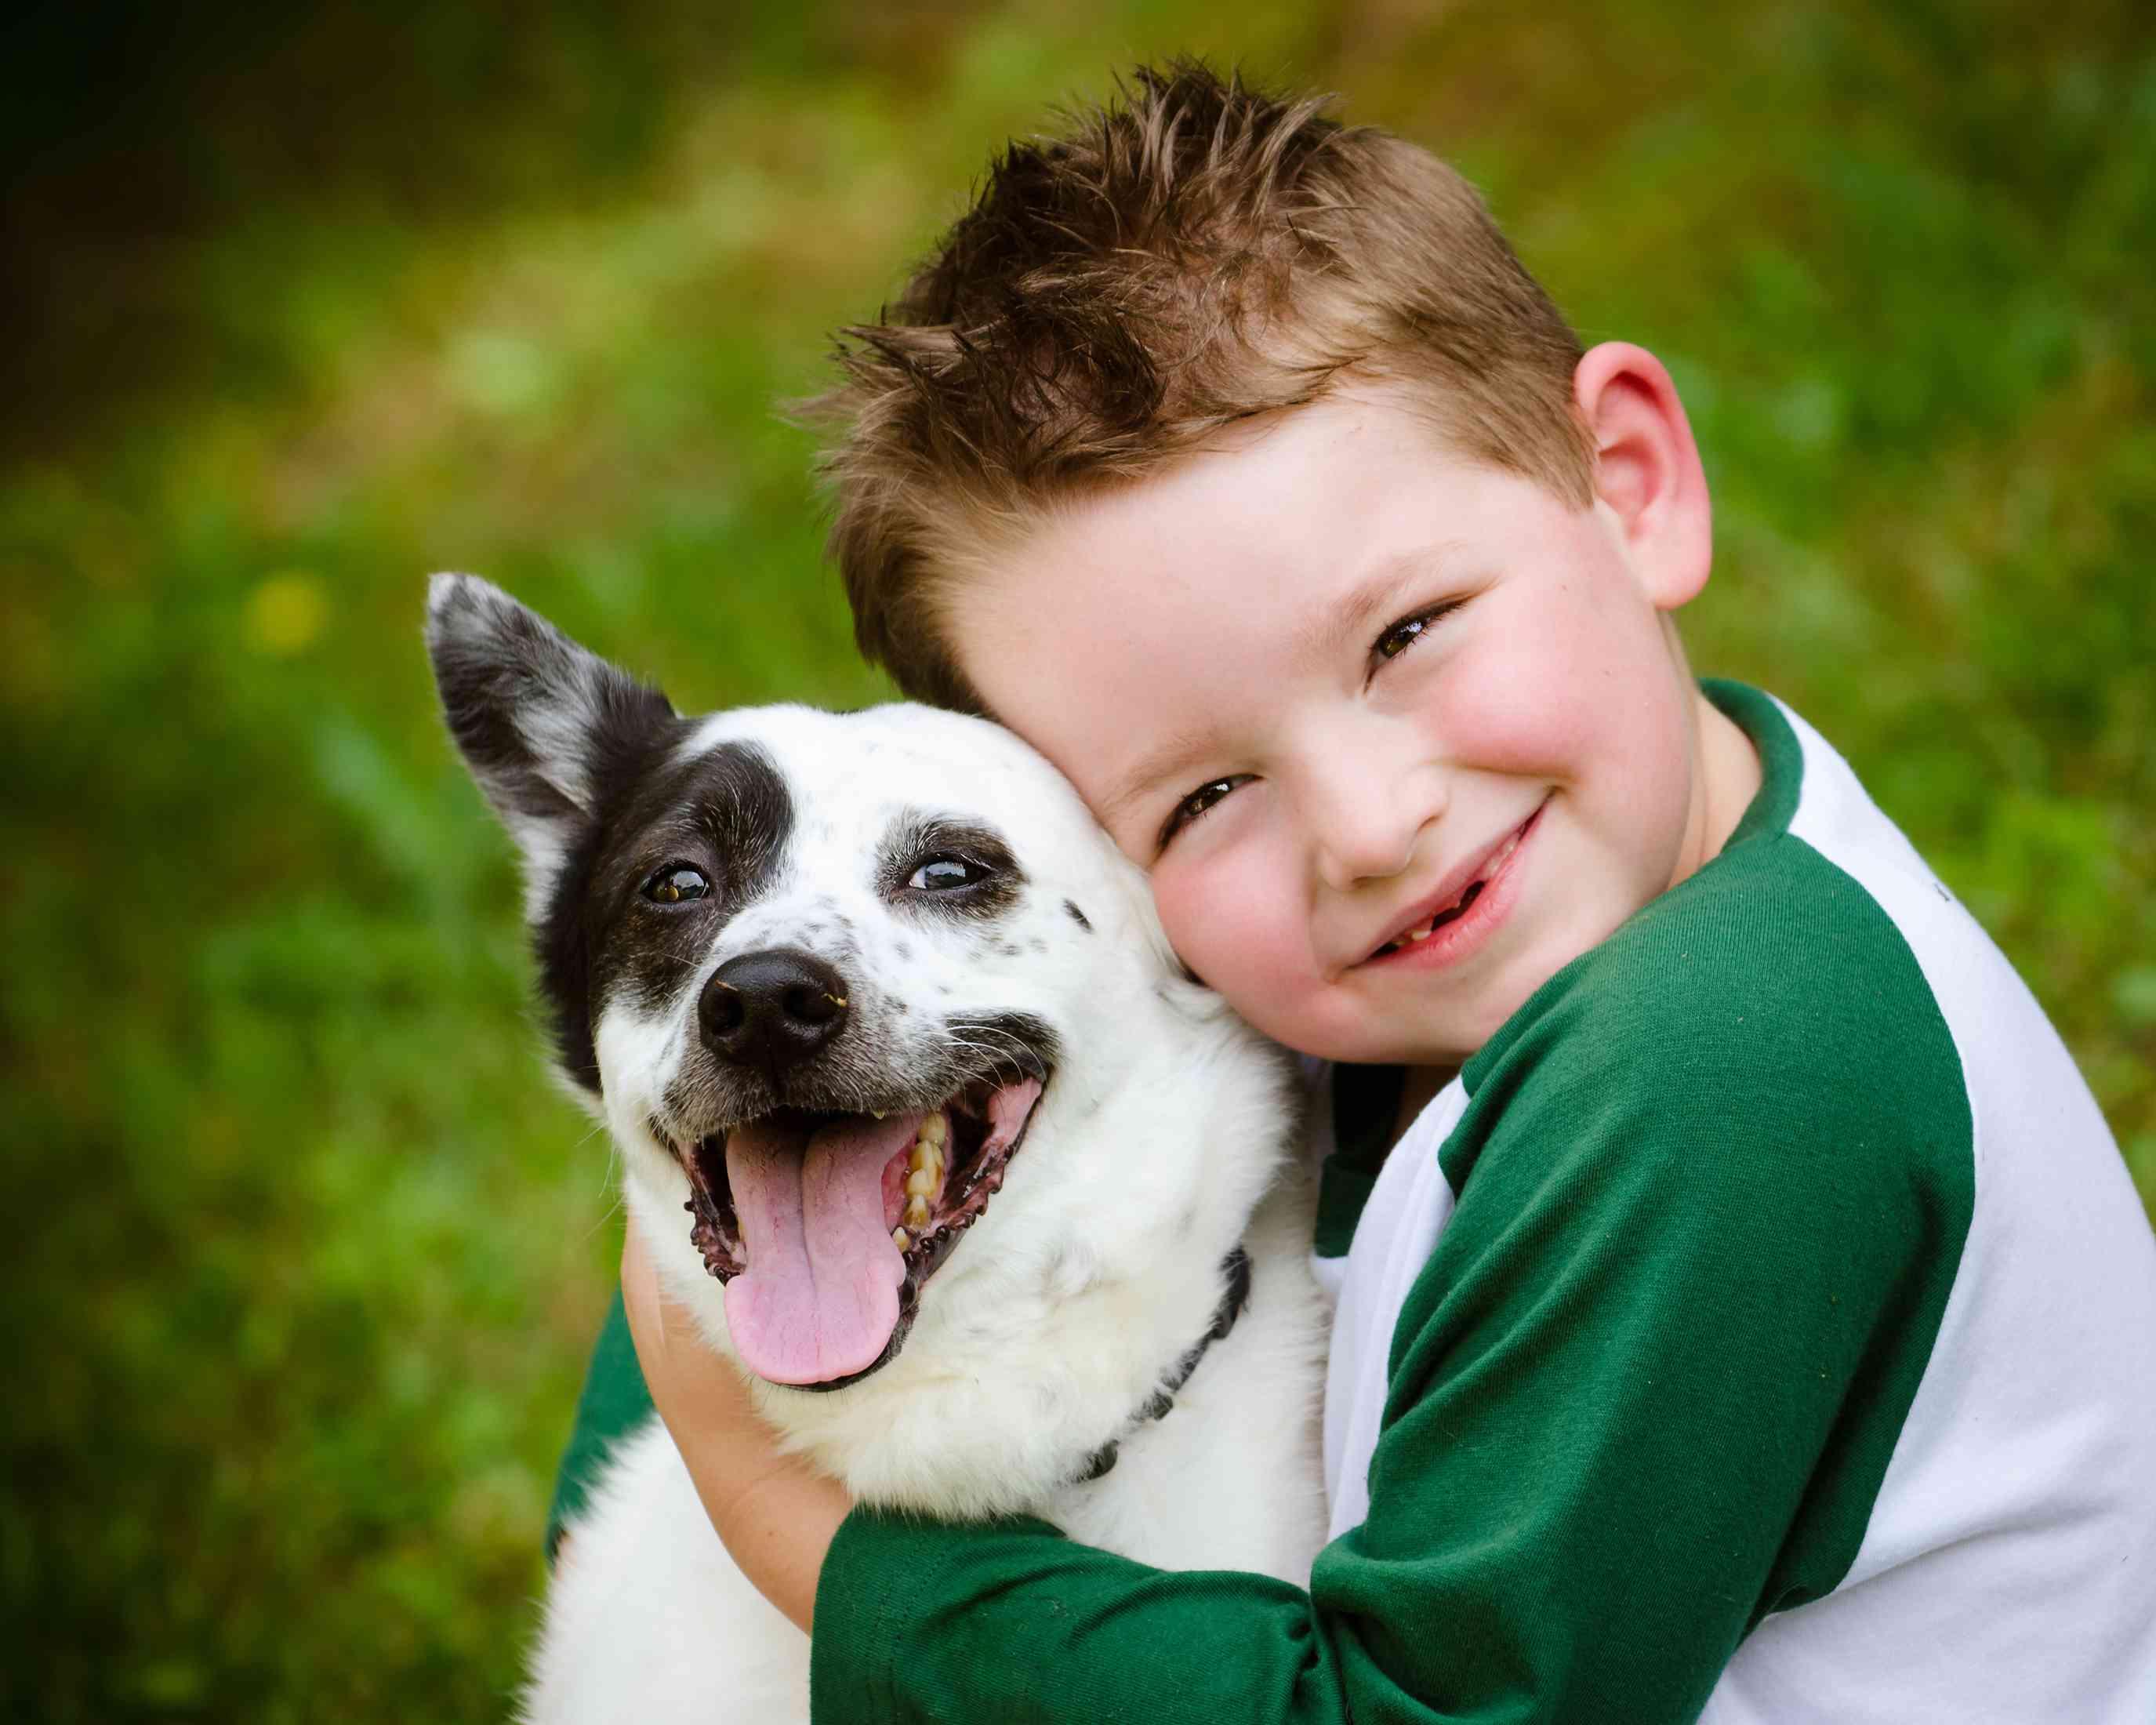 Joven abrazando perro feliz con manchas